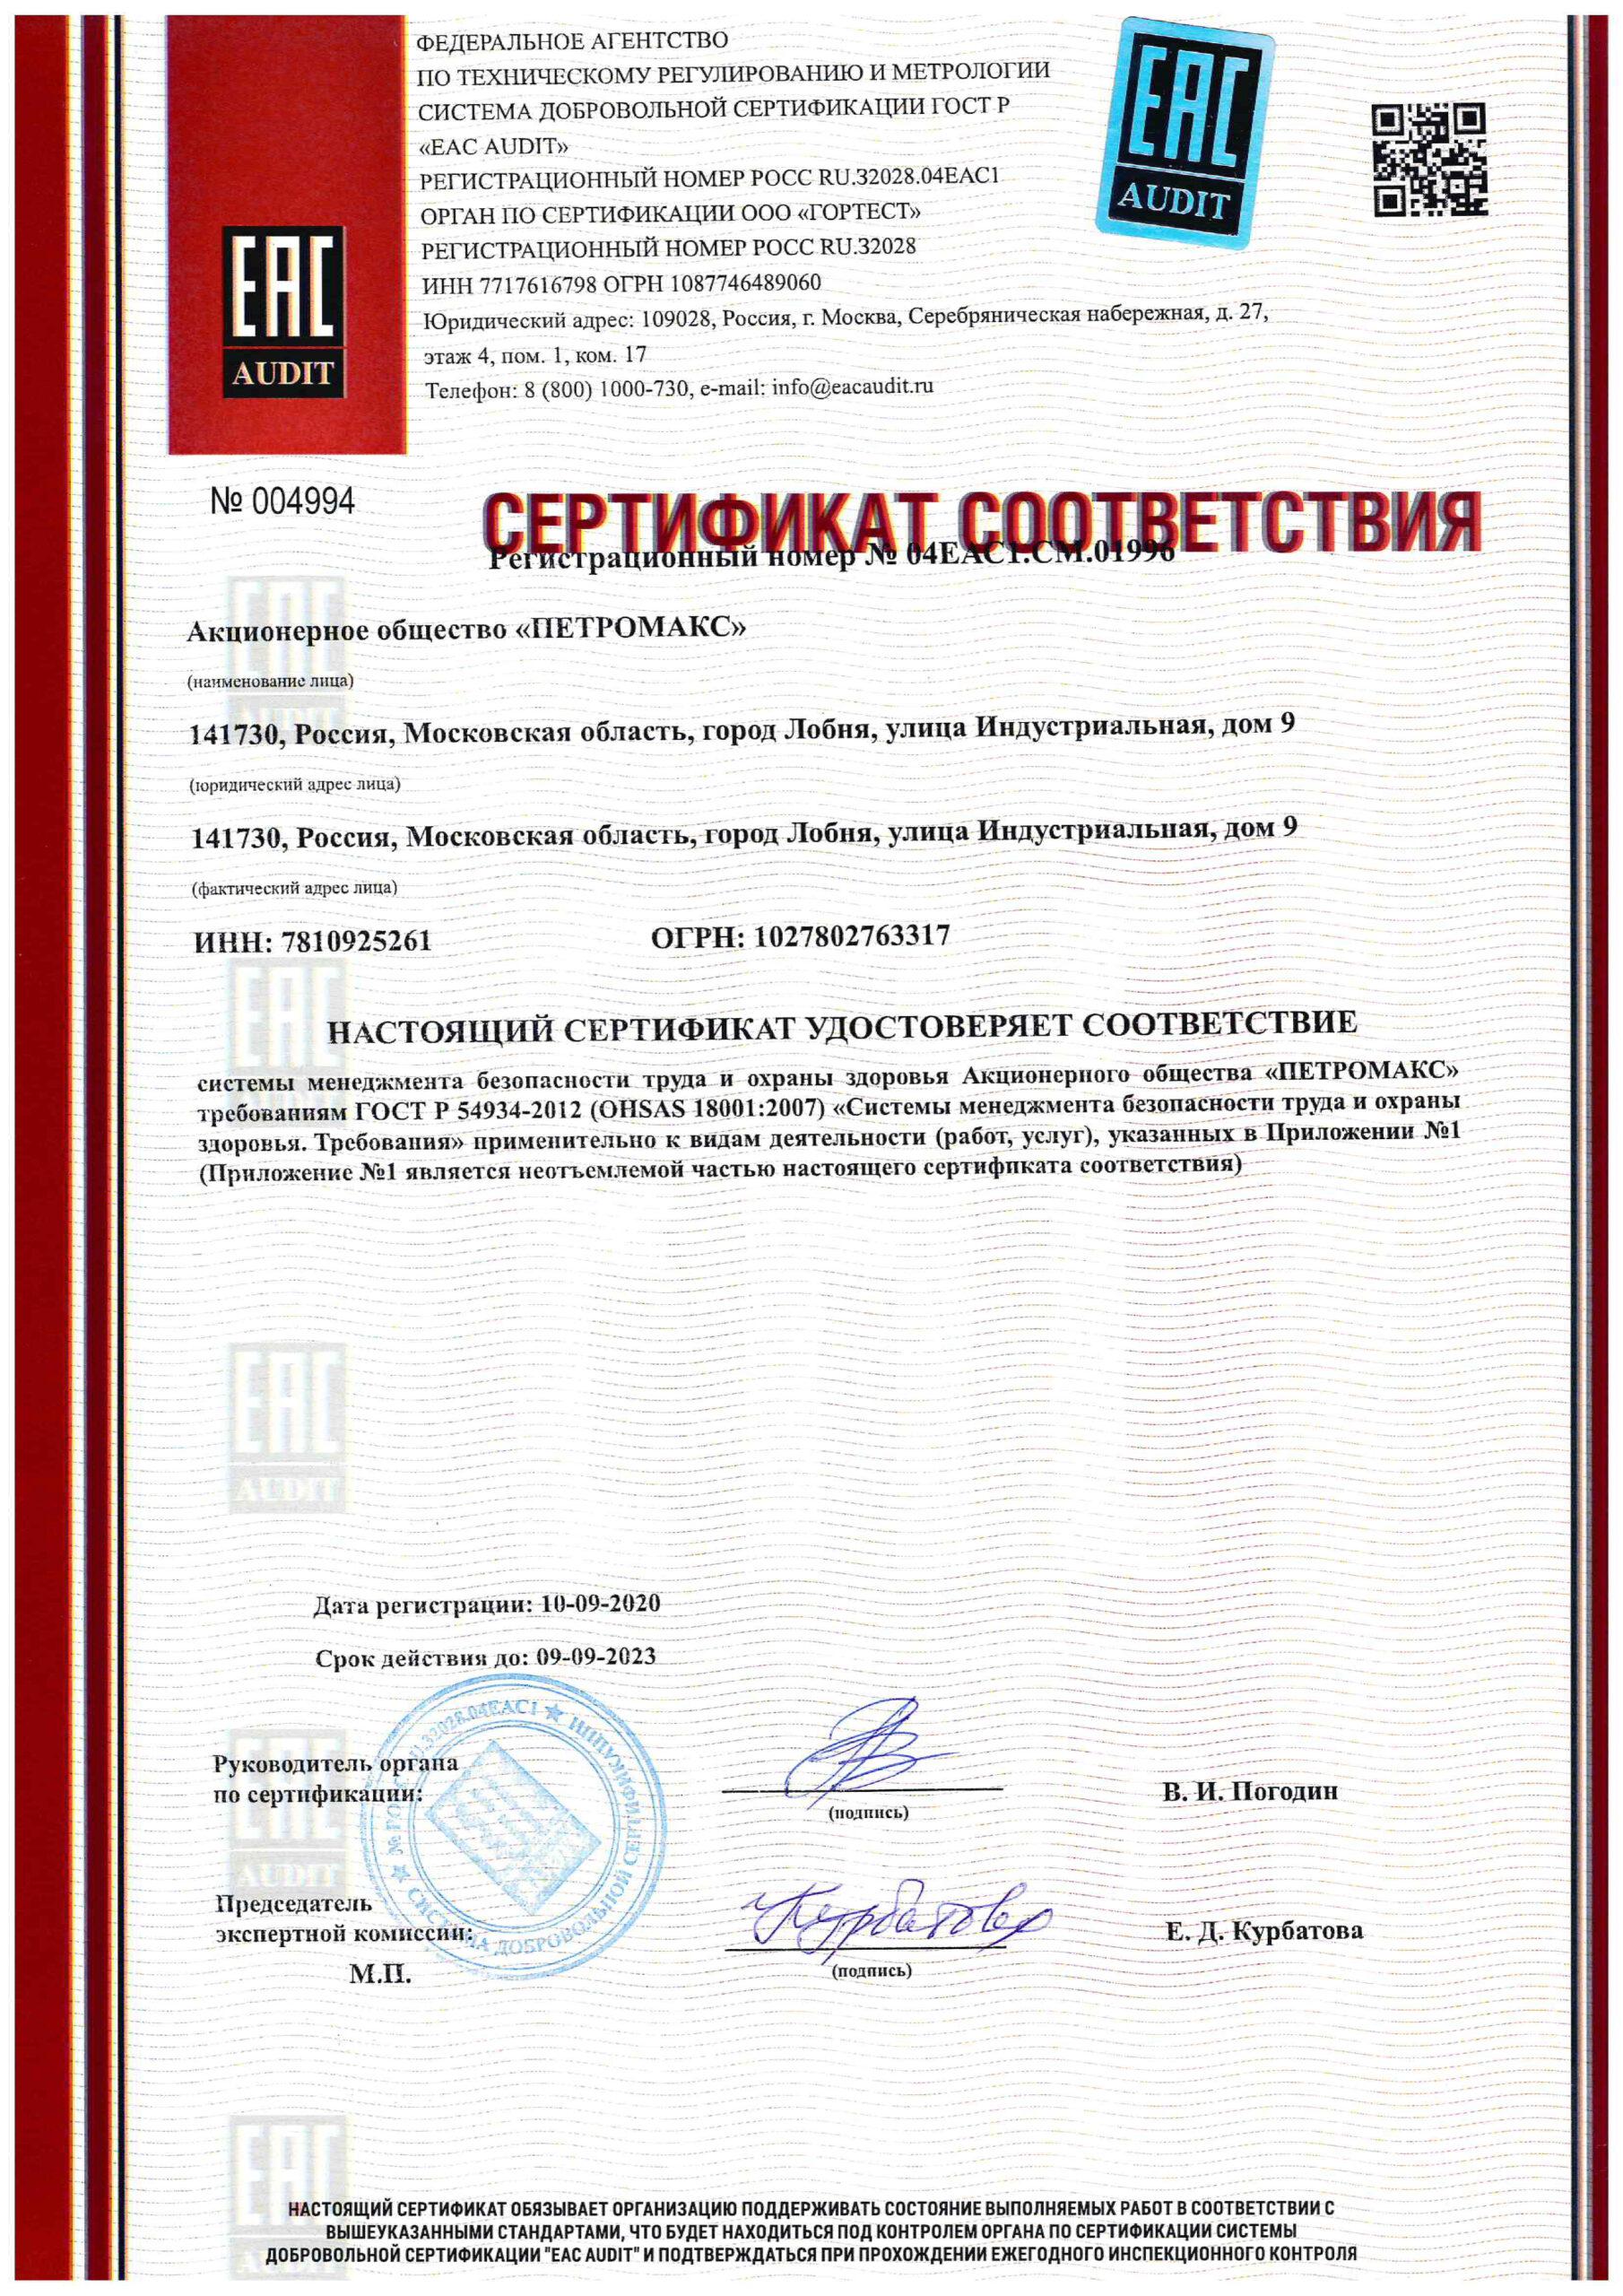 sertifikat-sootvetstviya-%e2%84%9604eac1-cm-01996_2-1